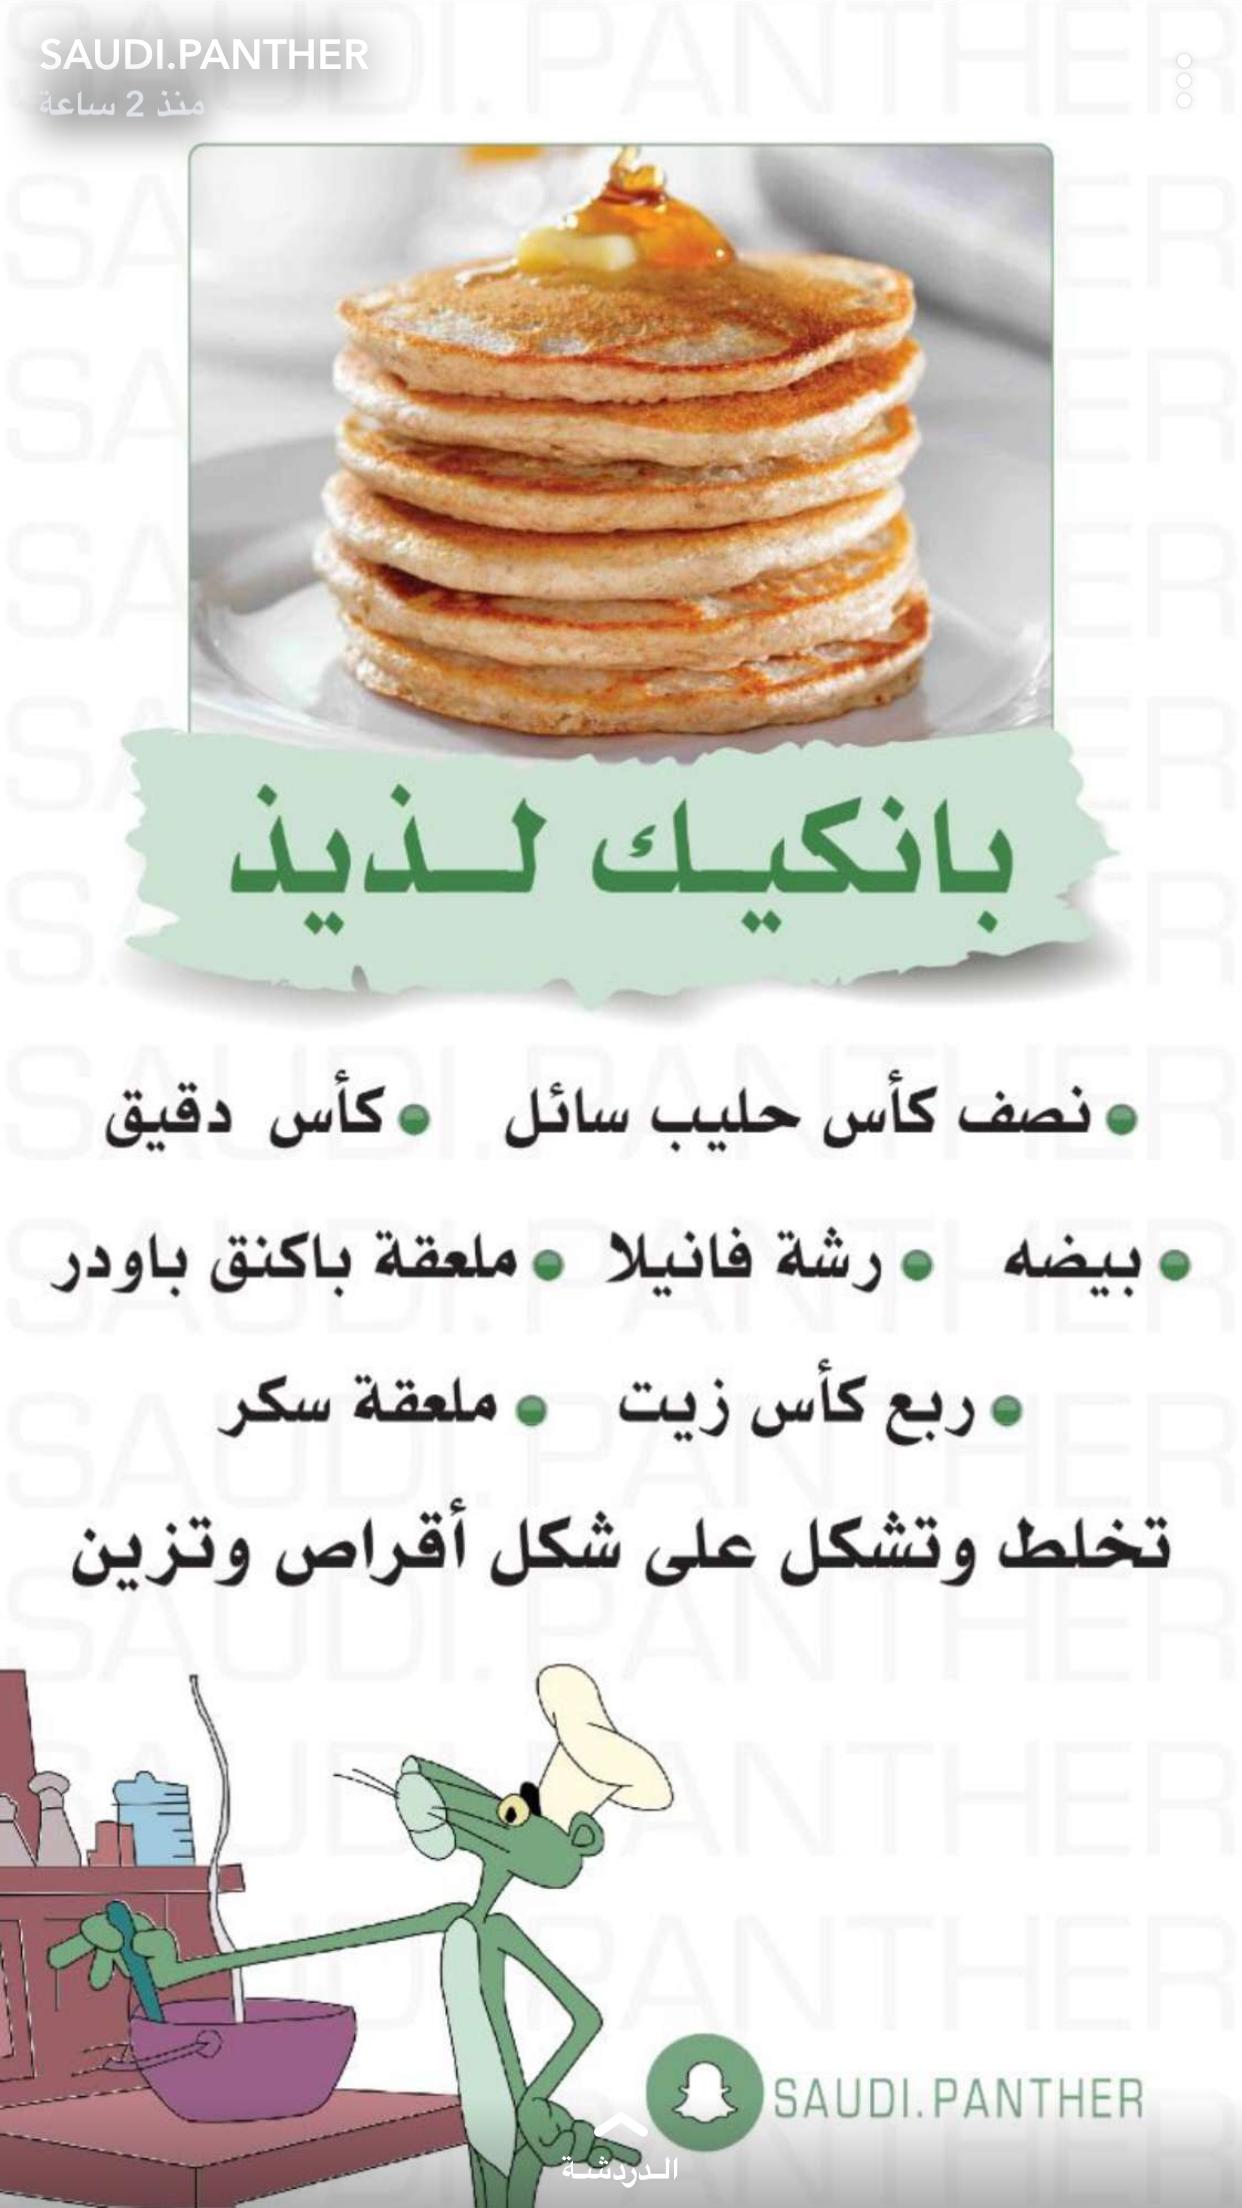 بان كيك لذيذ Yummy Food Dessert Cooking Recipes Desserts Food Receipes